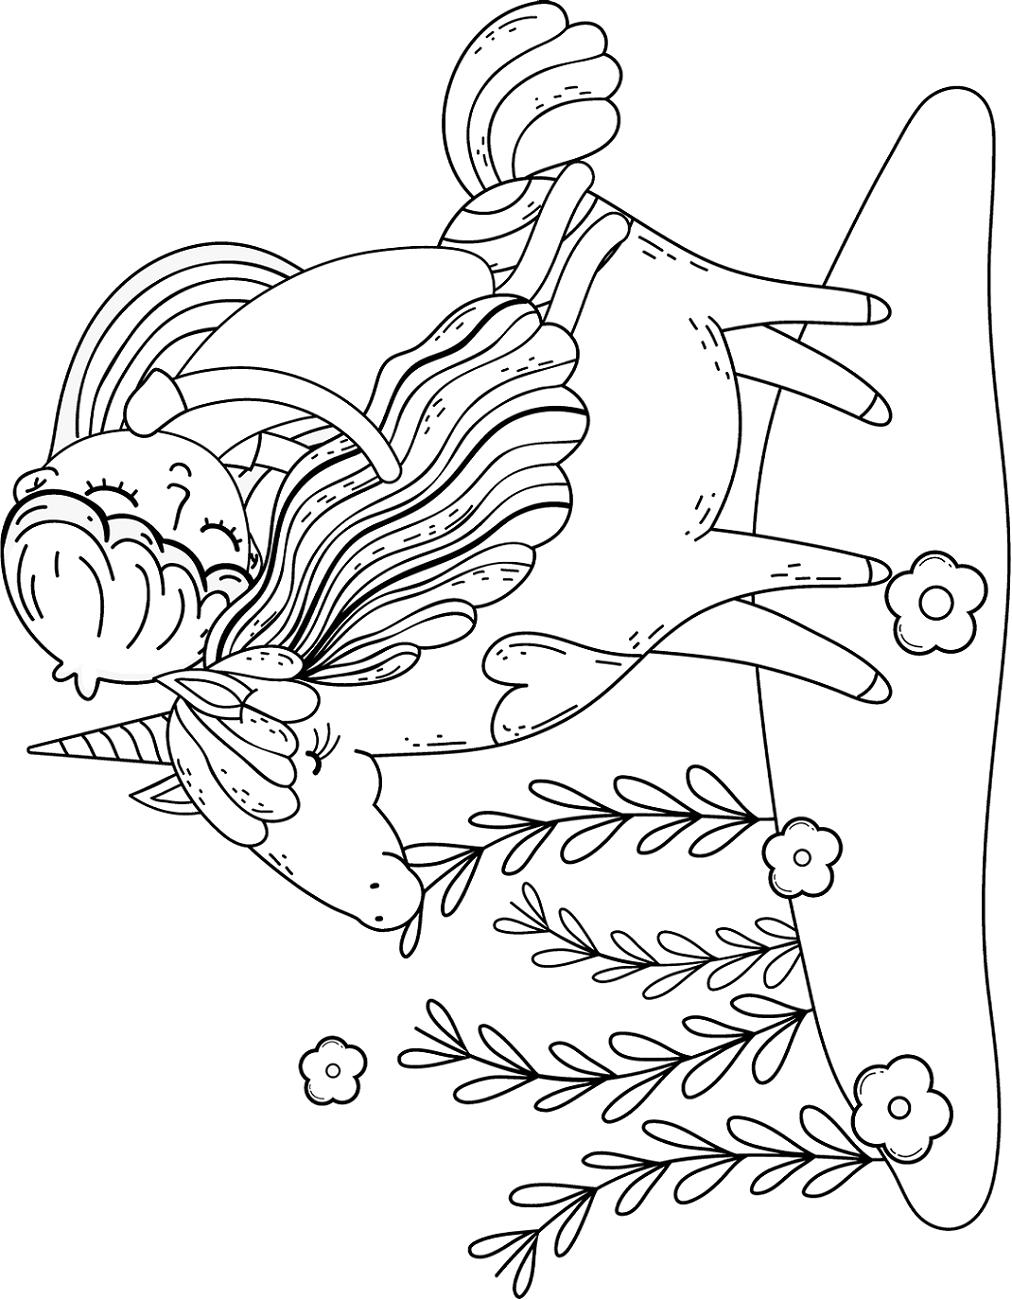 Little Princess Sleeping On Unicorn Coloring Page - Free ...